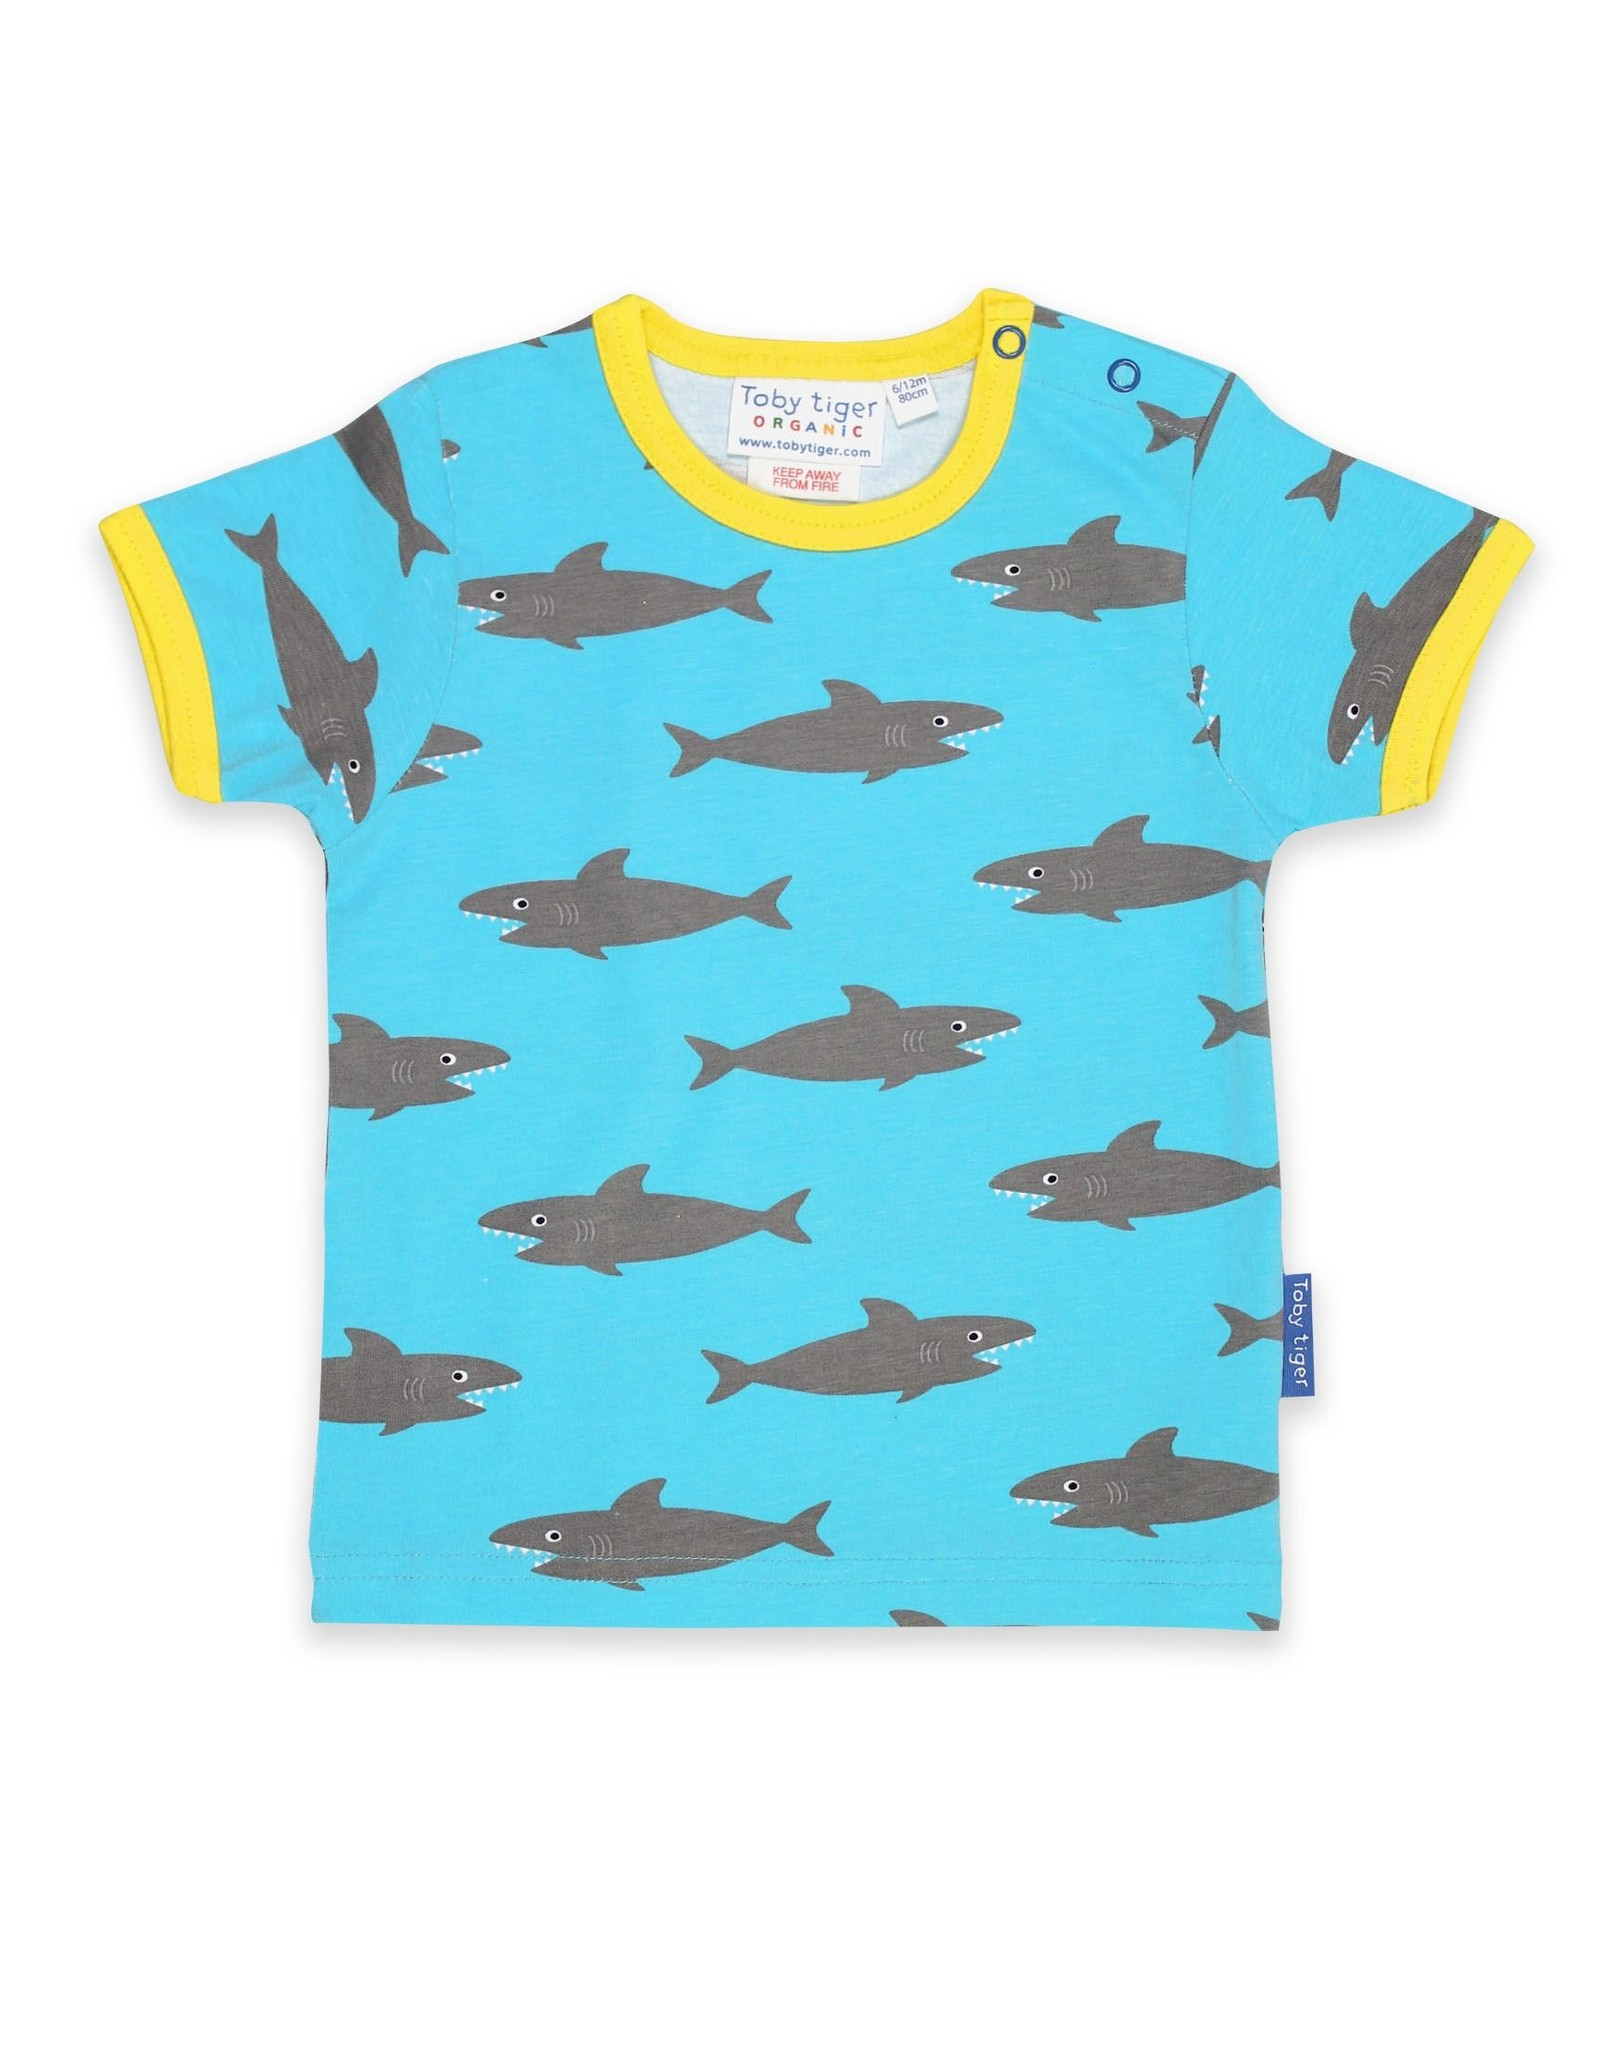 Toby Tiger Kinder t-shirt - haaien !